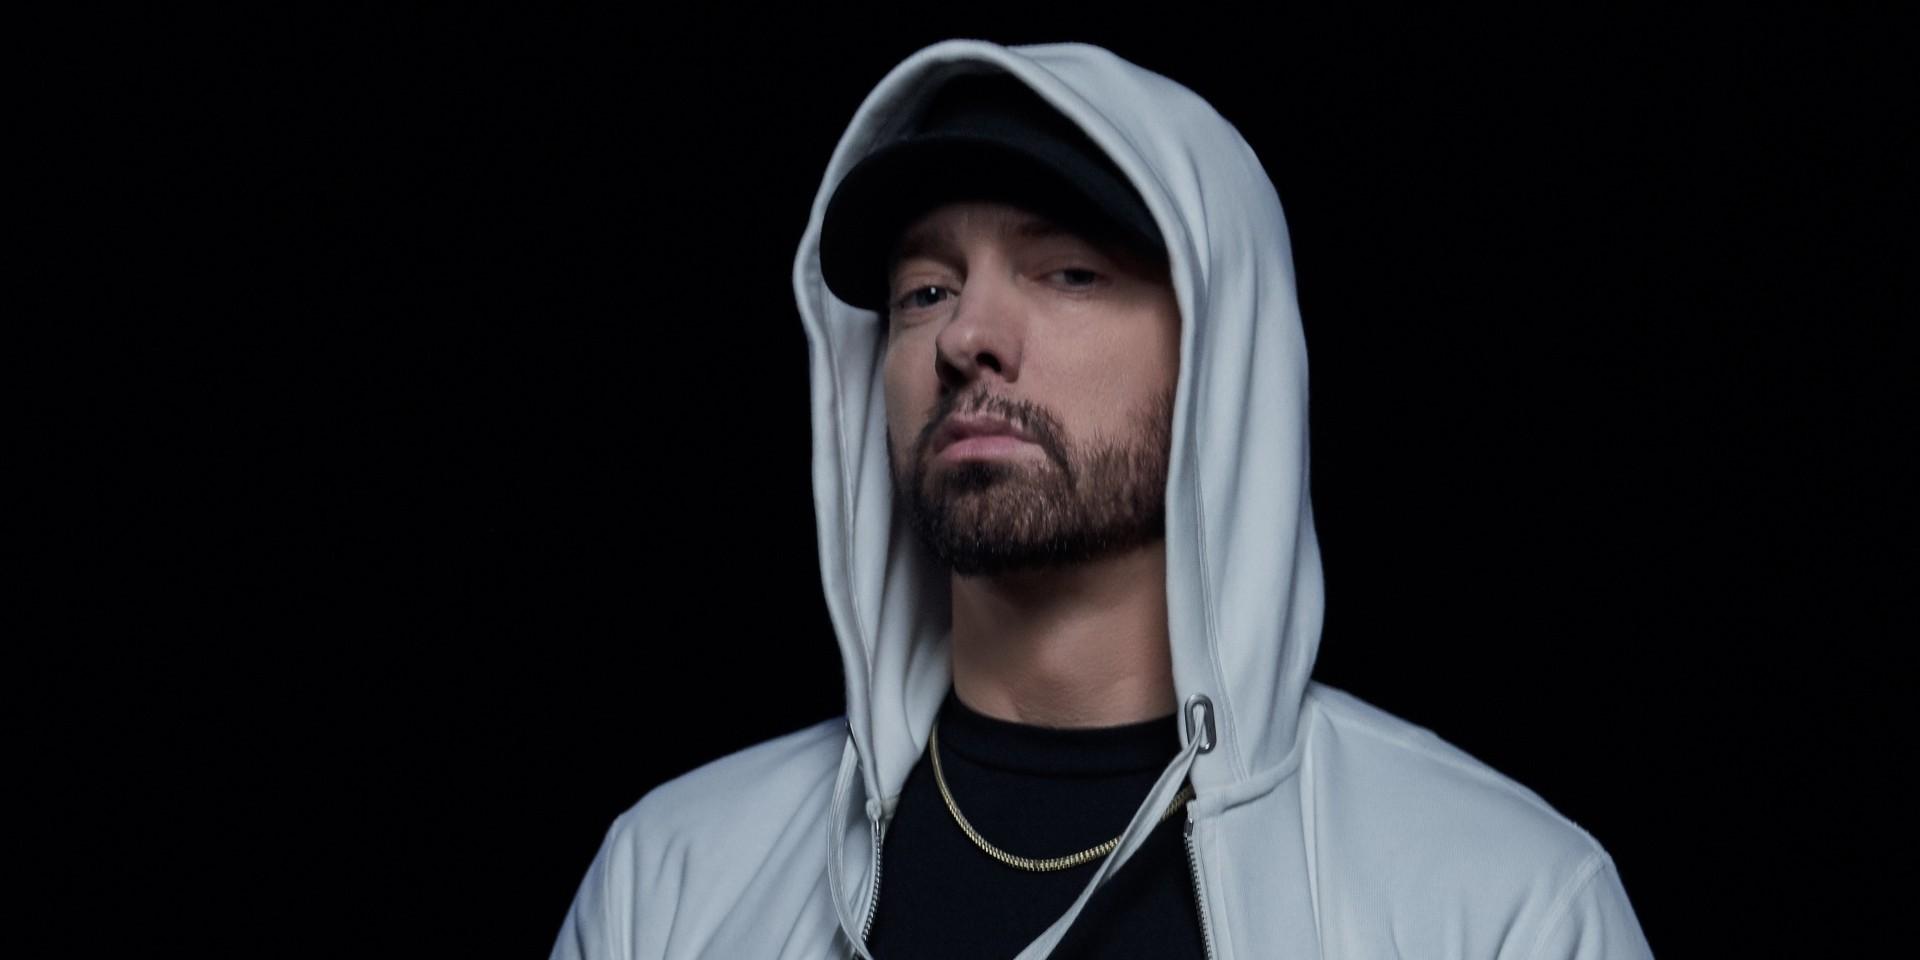 Eminem releases surprise album Kamikaze - listen